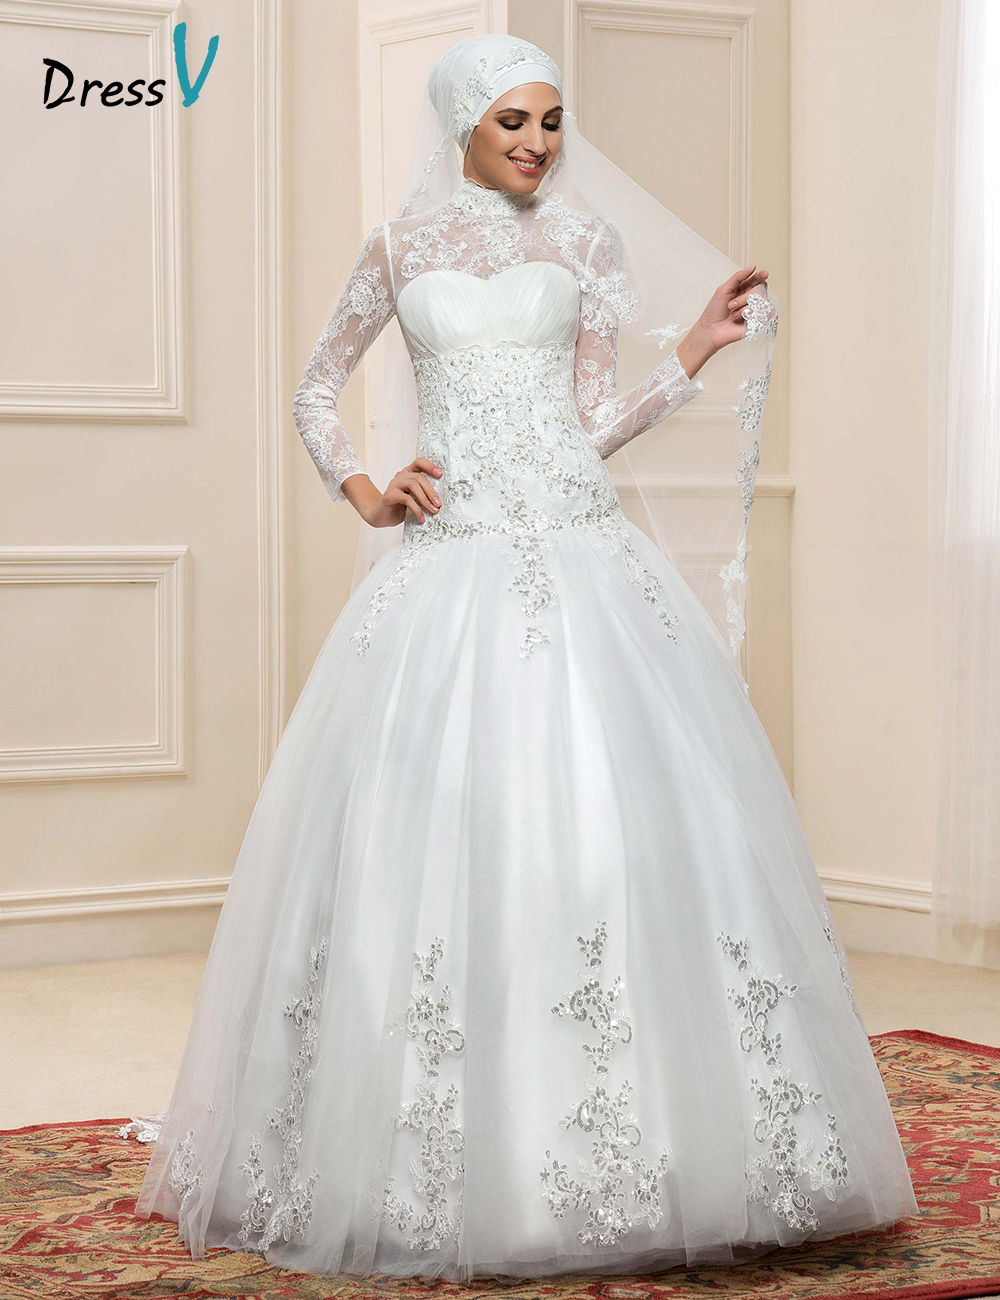 Dressv Muslim Wedding Dresses Lace Long Sleeves High Neck Arabic ...